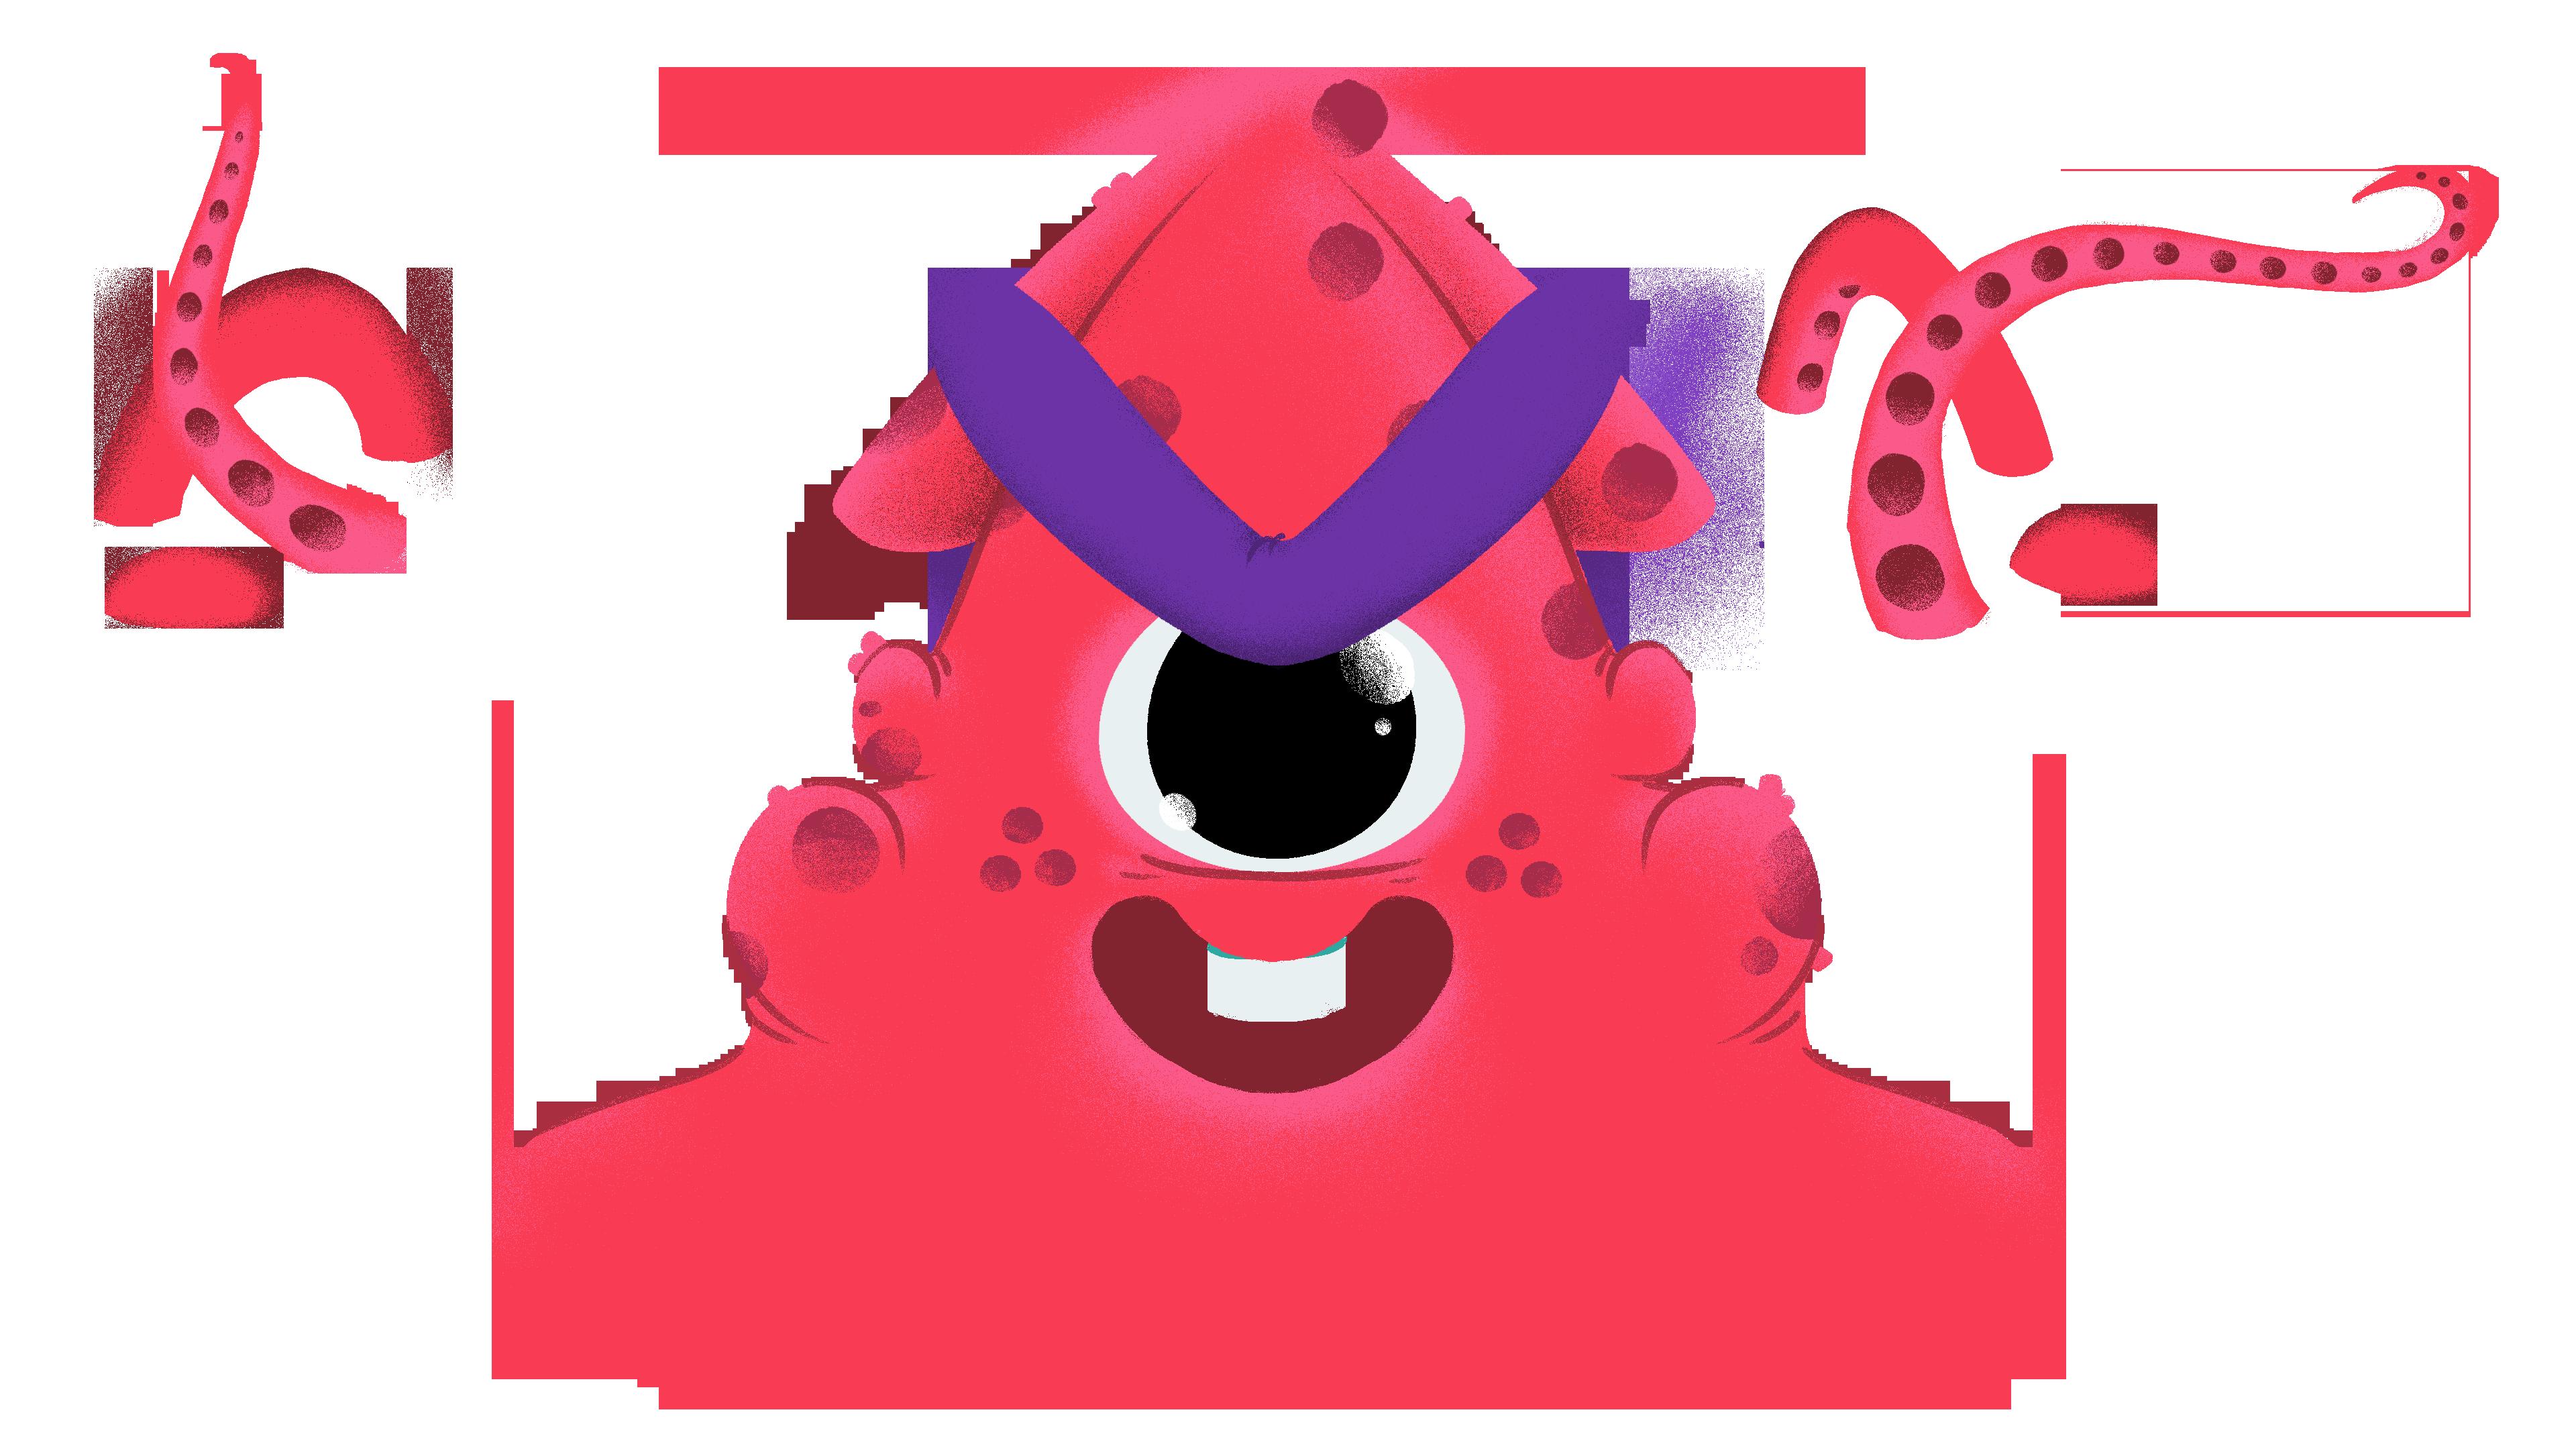 Kraken_CharacterDesign_rb001